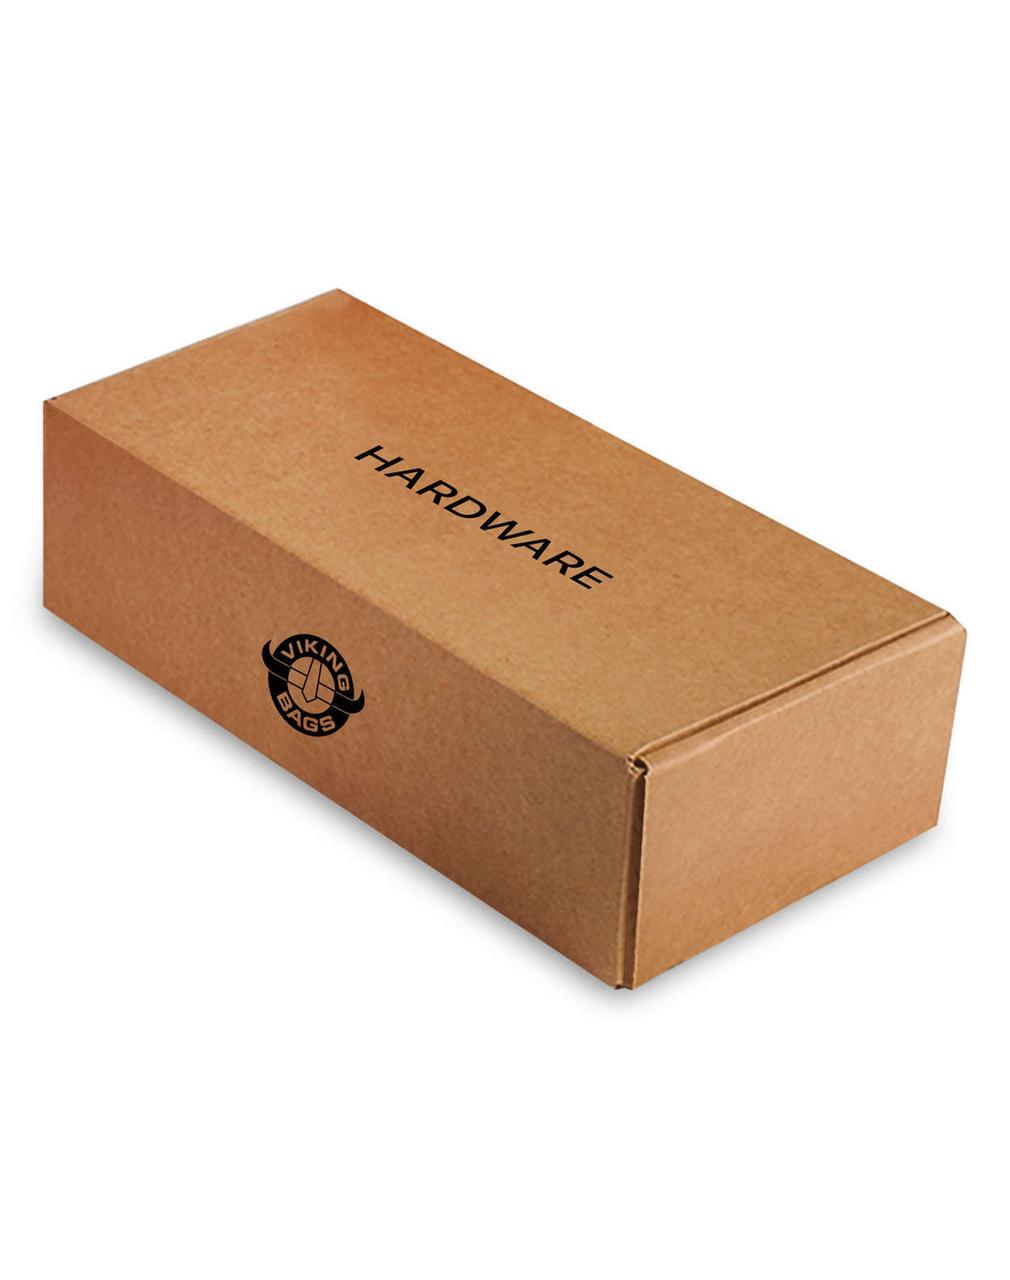 Honda VTX 1800 F Viking Raven Medium Leather Motorcycle Saddlebags Hardware Box